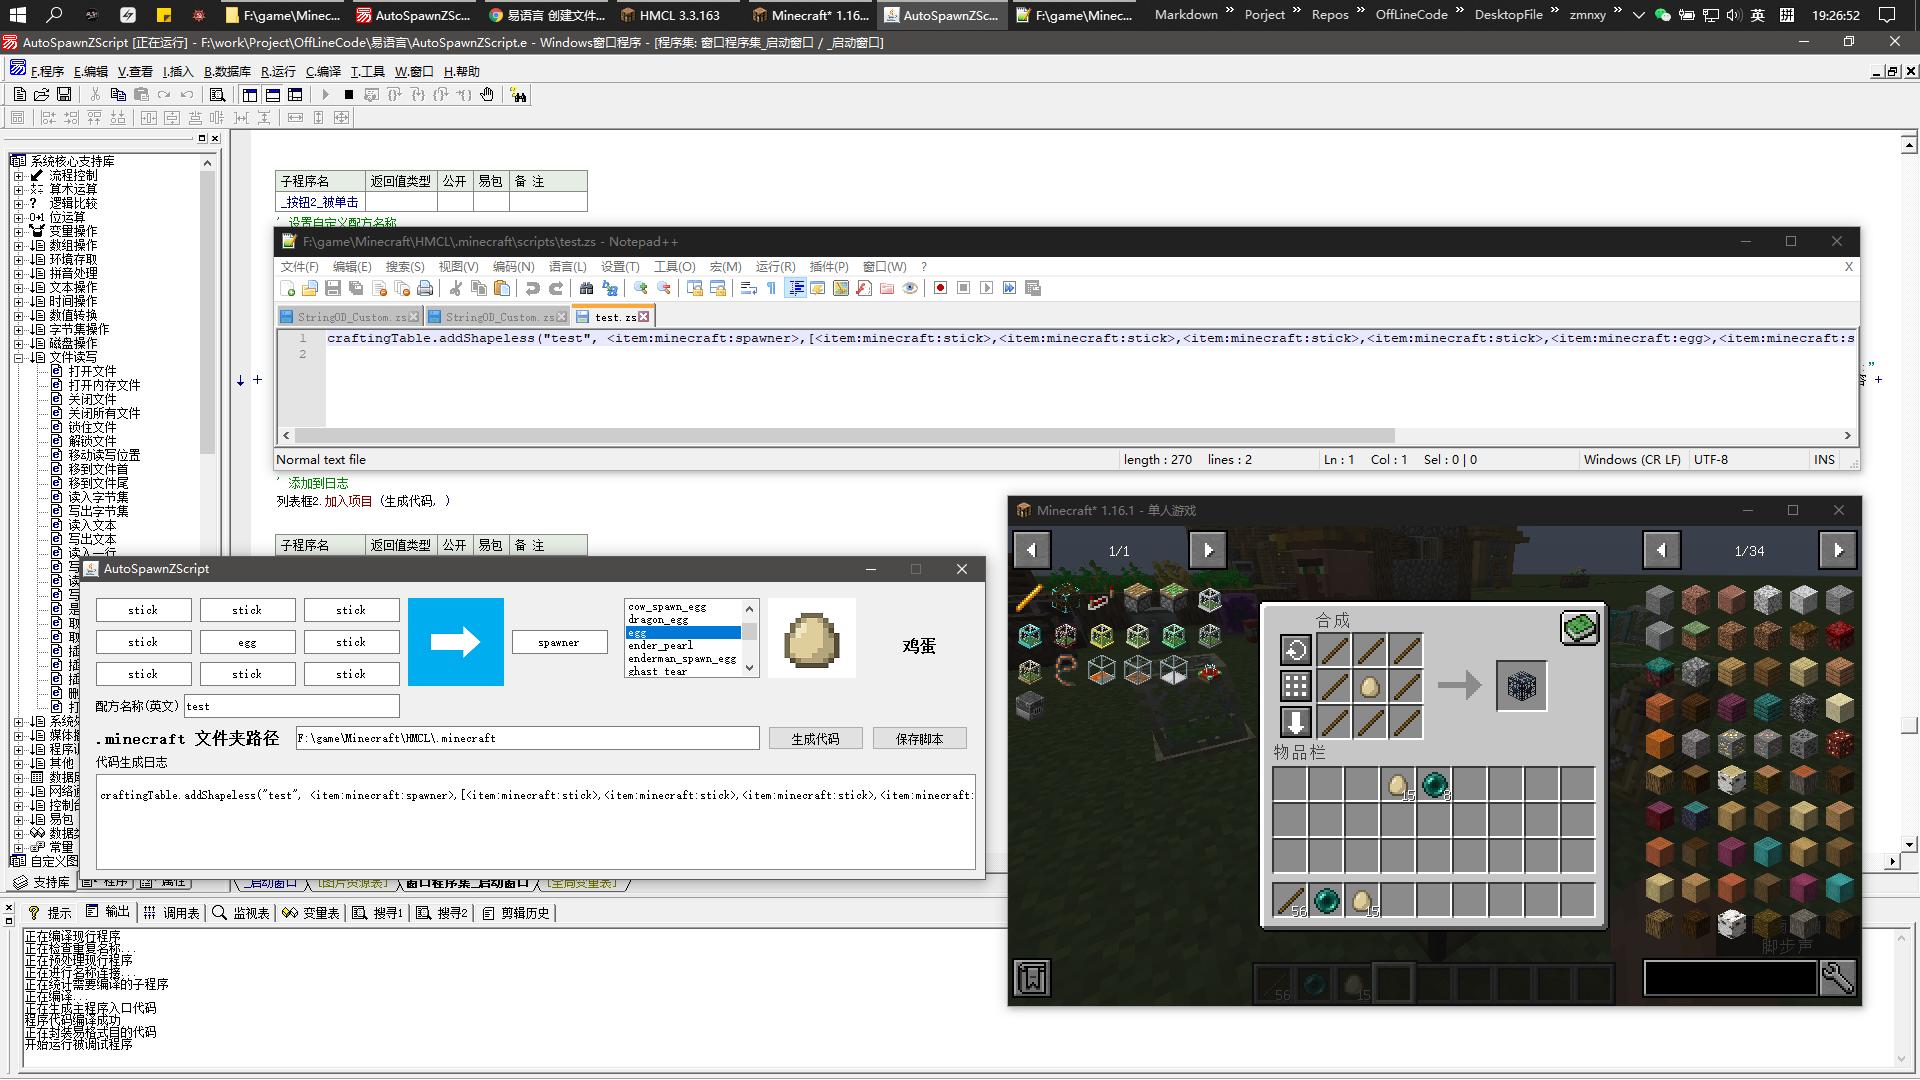 AutoSpawnZScript - v0.1